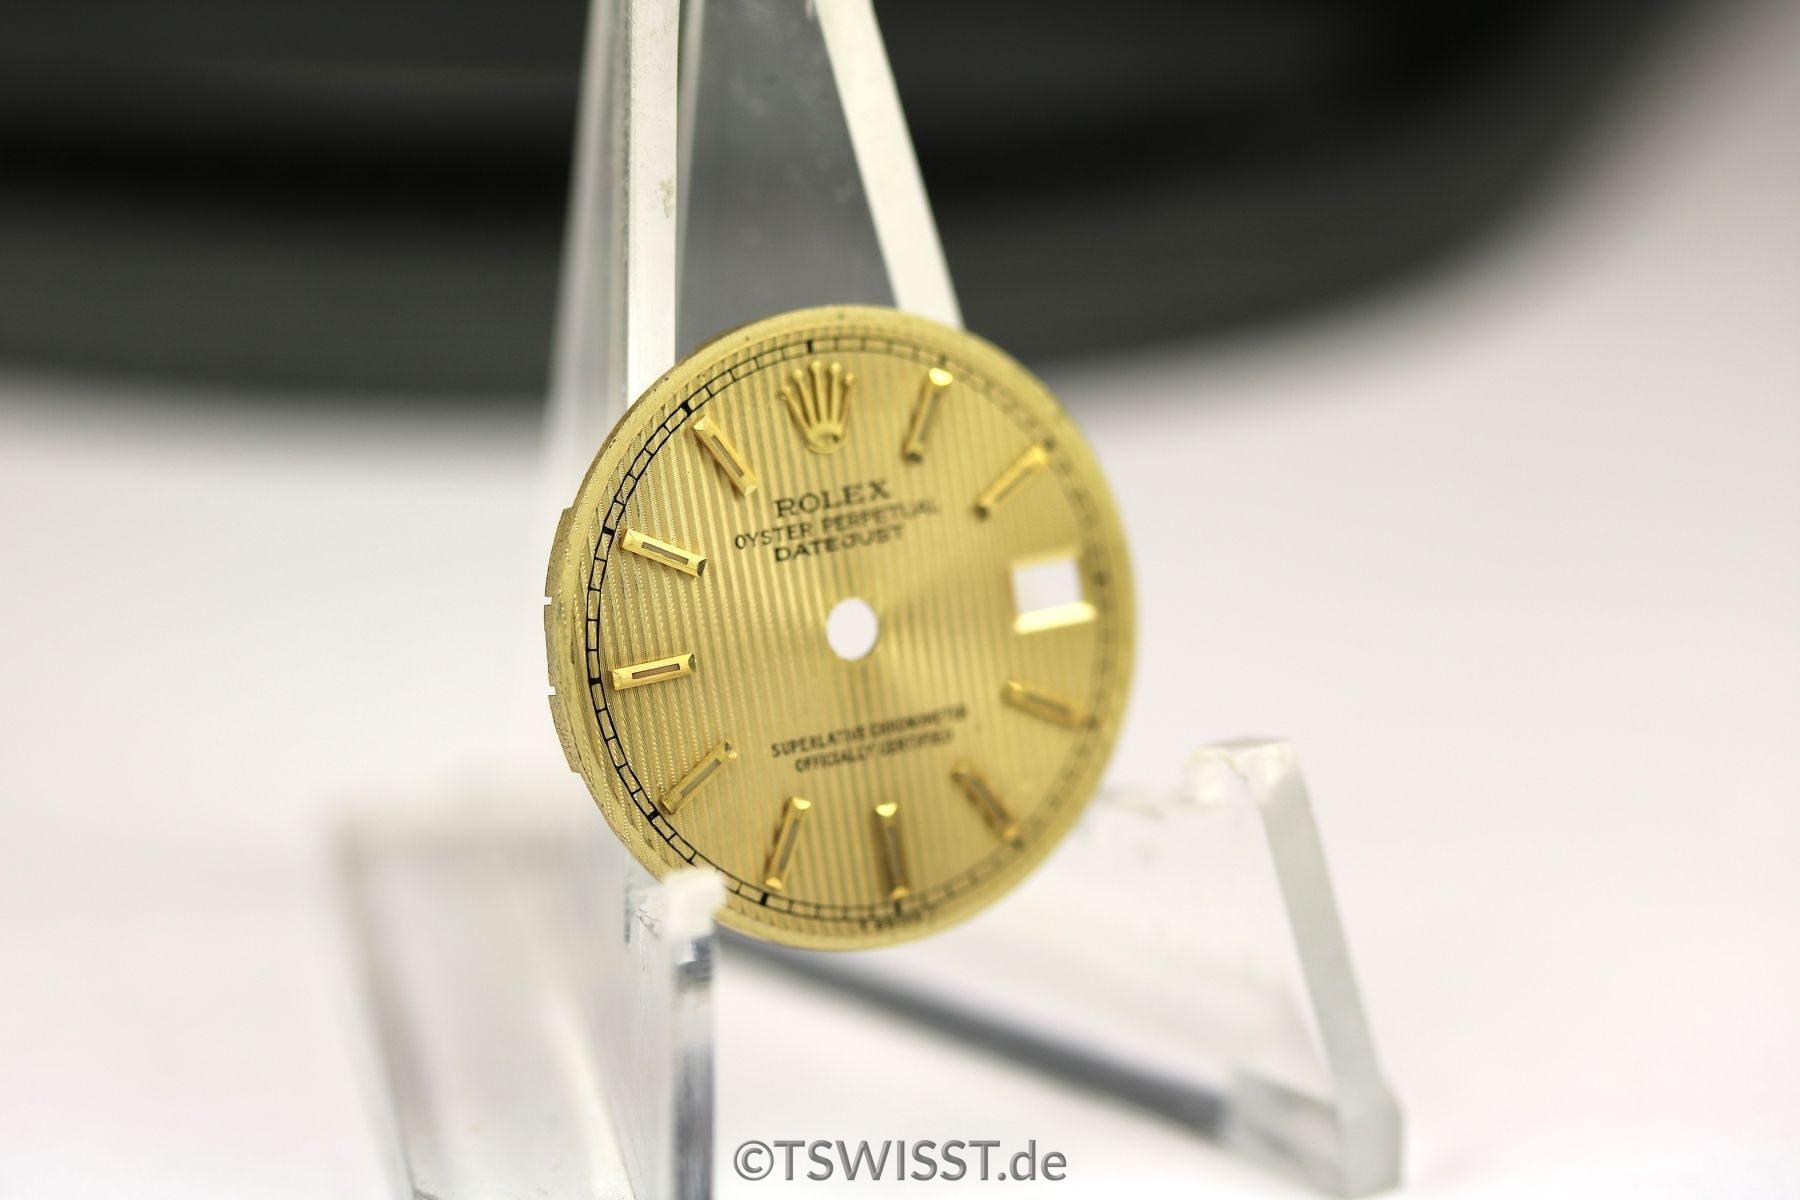 Rolex Date-Just dial